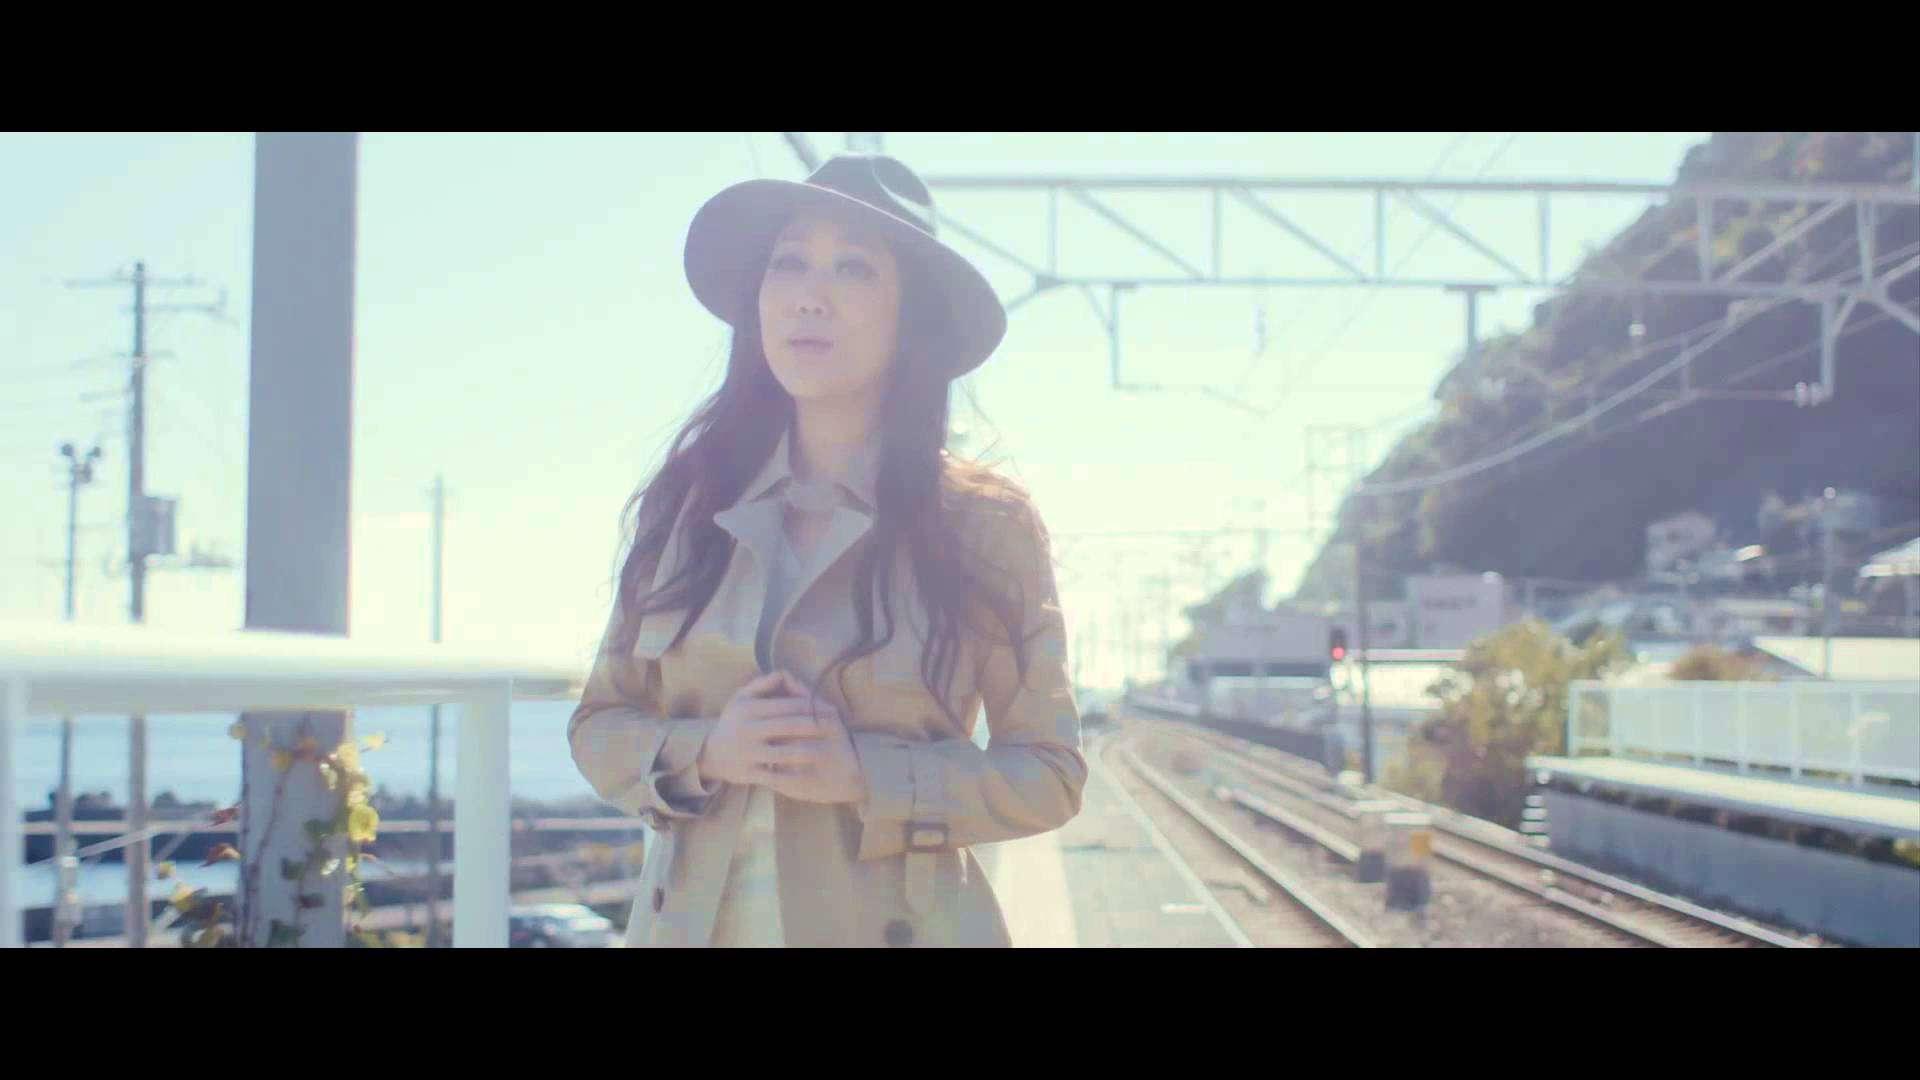 JUJU 「ANNIVERSARY」(2nd Cover Album 「Request Ⅱ」) - YouTube